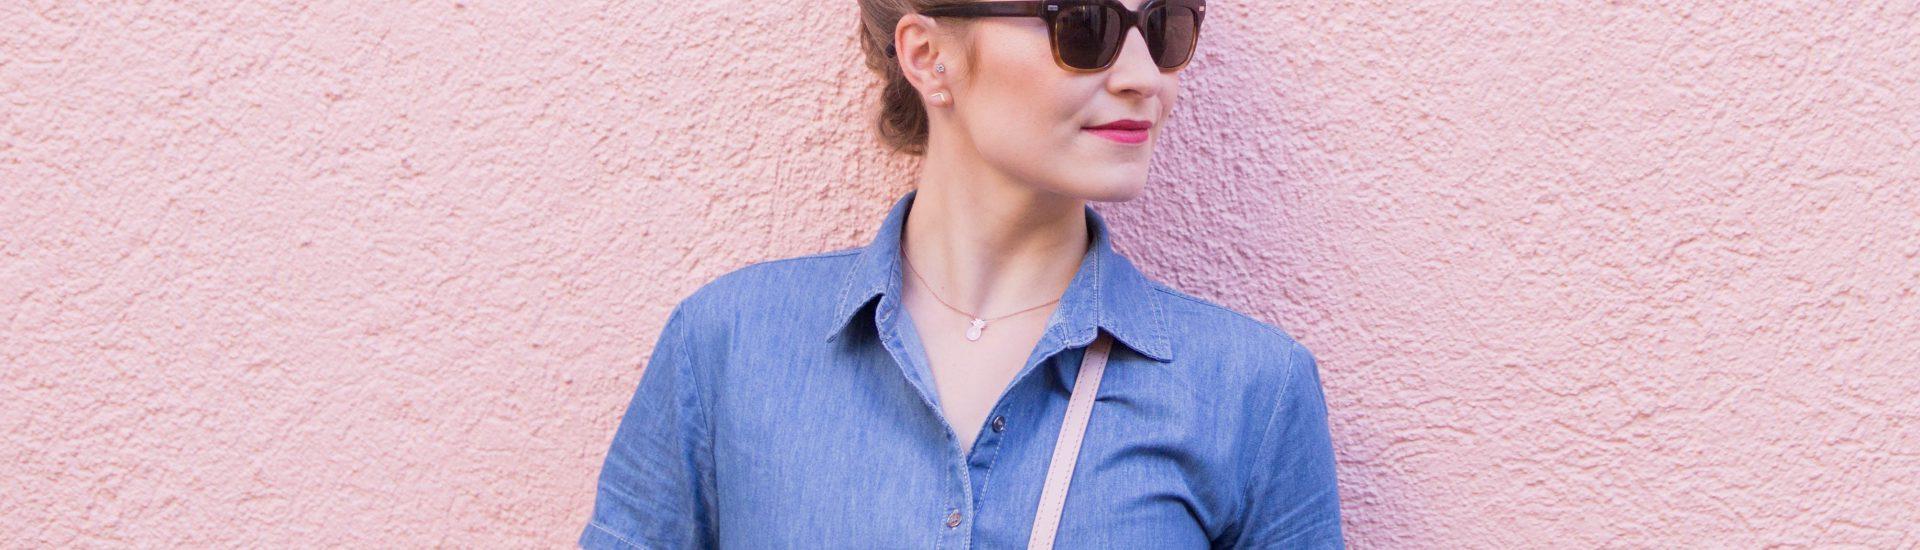 denim dress outfit fall fashion autumn fashion blog blogger millenial pink